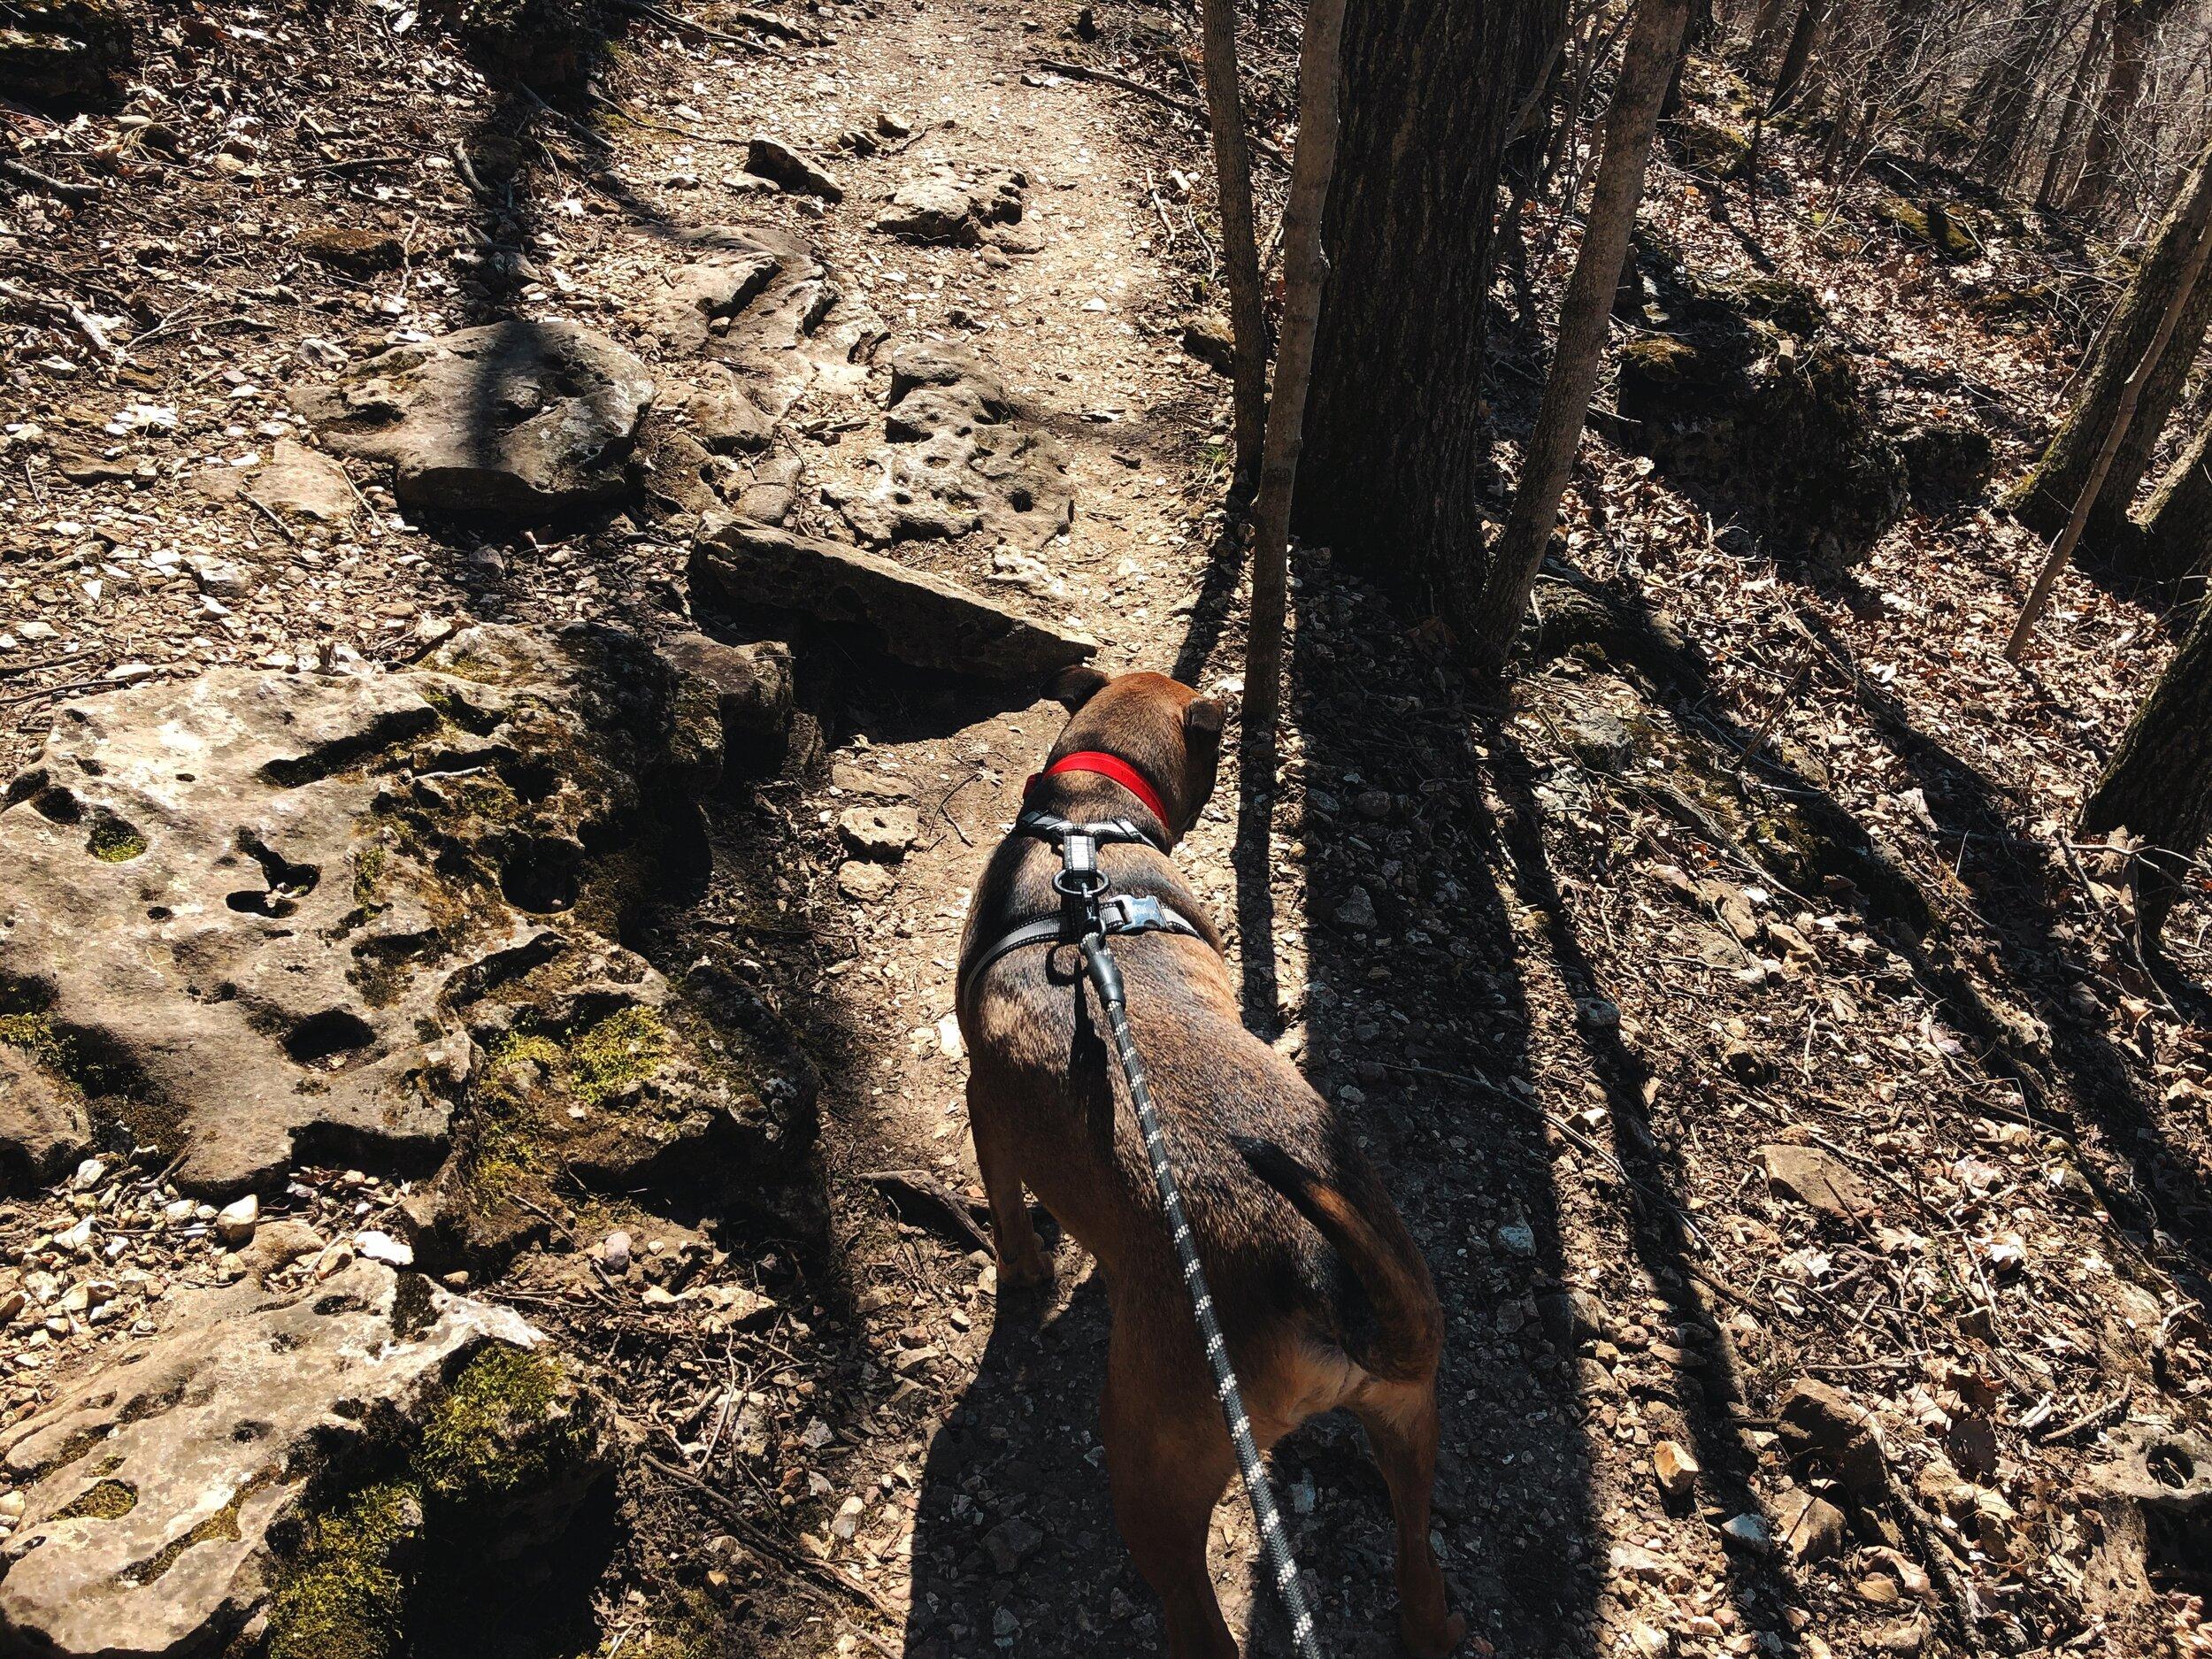 rockswoods-reservation-wildwood-missouri0540.JPG